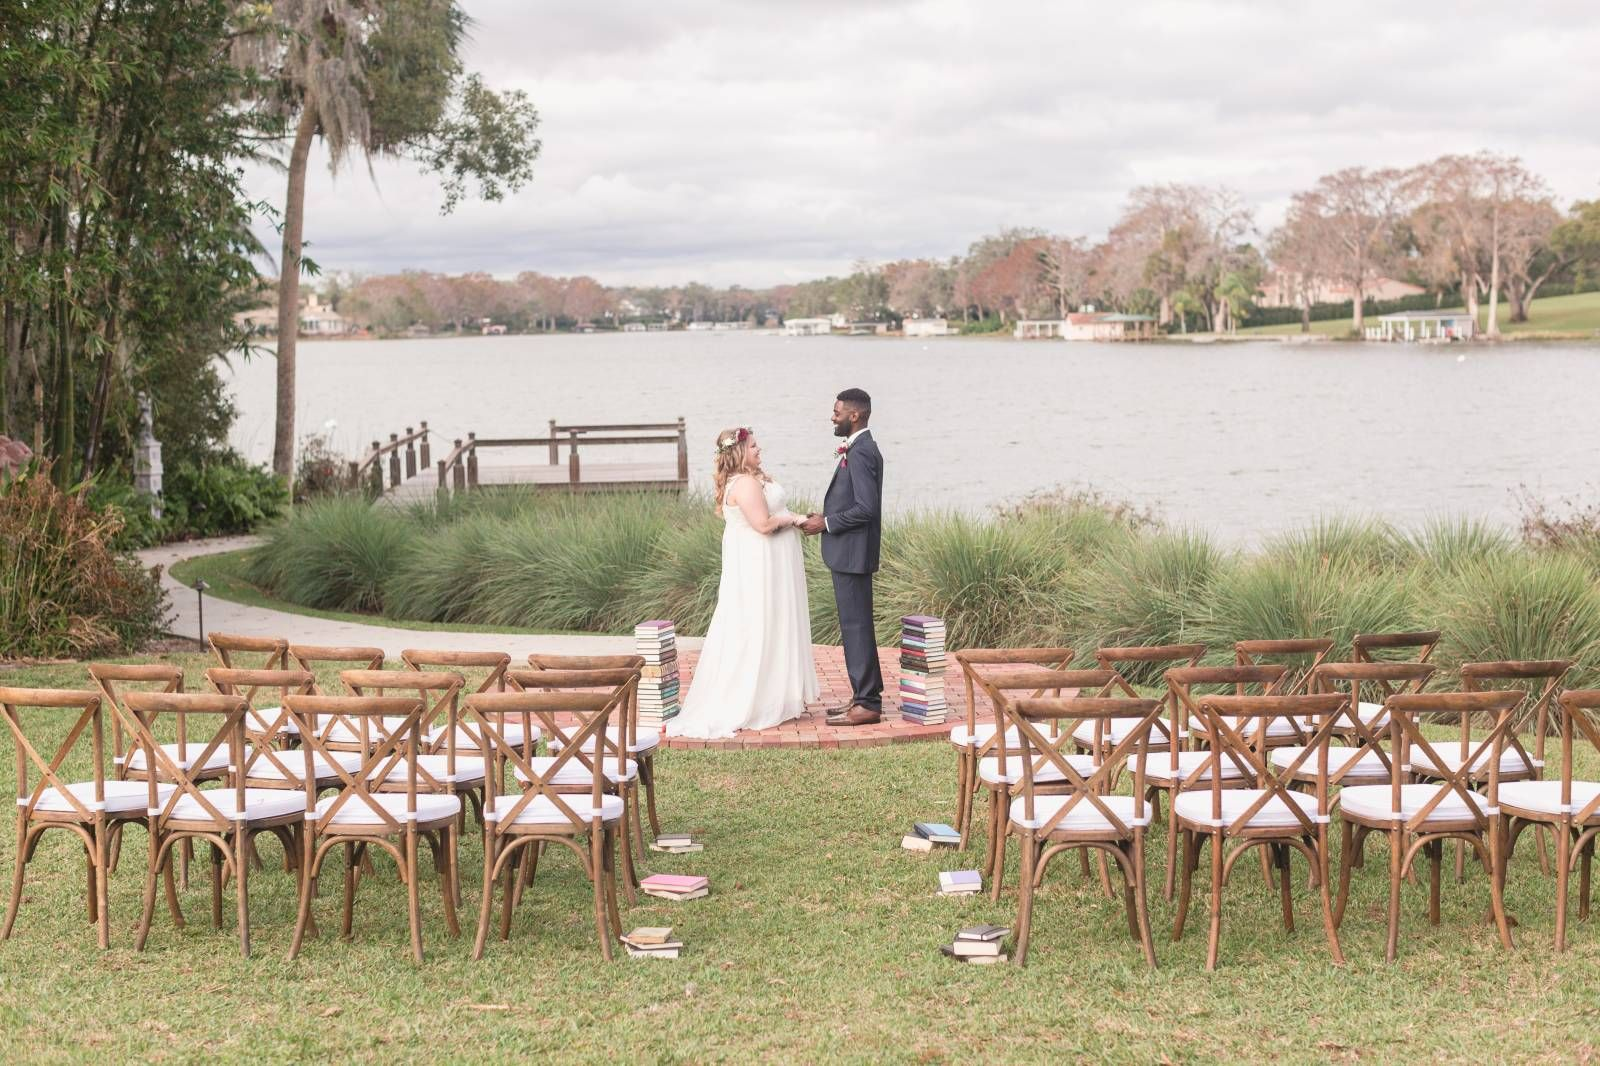 Storybook Love Inspiration Shoot Orange Blossom Bride Orlando Wedding Venues Lakefront Weddings Lake Wedding Ceremony